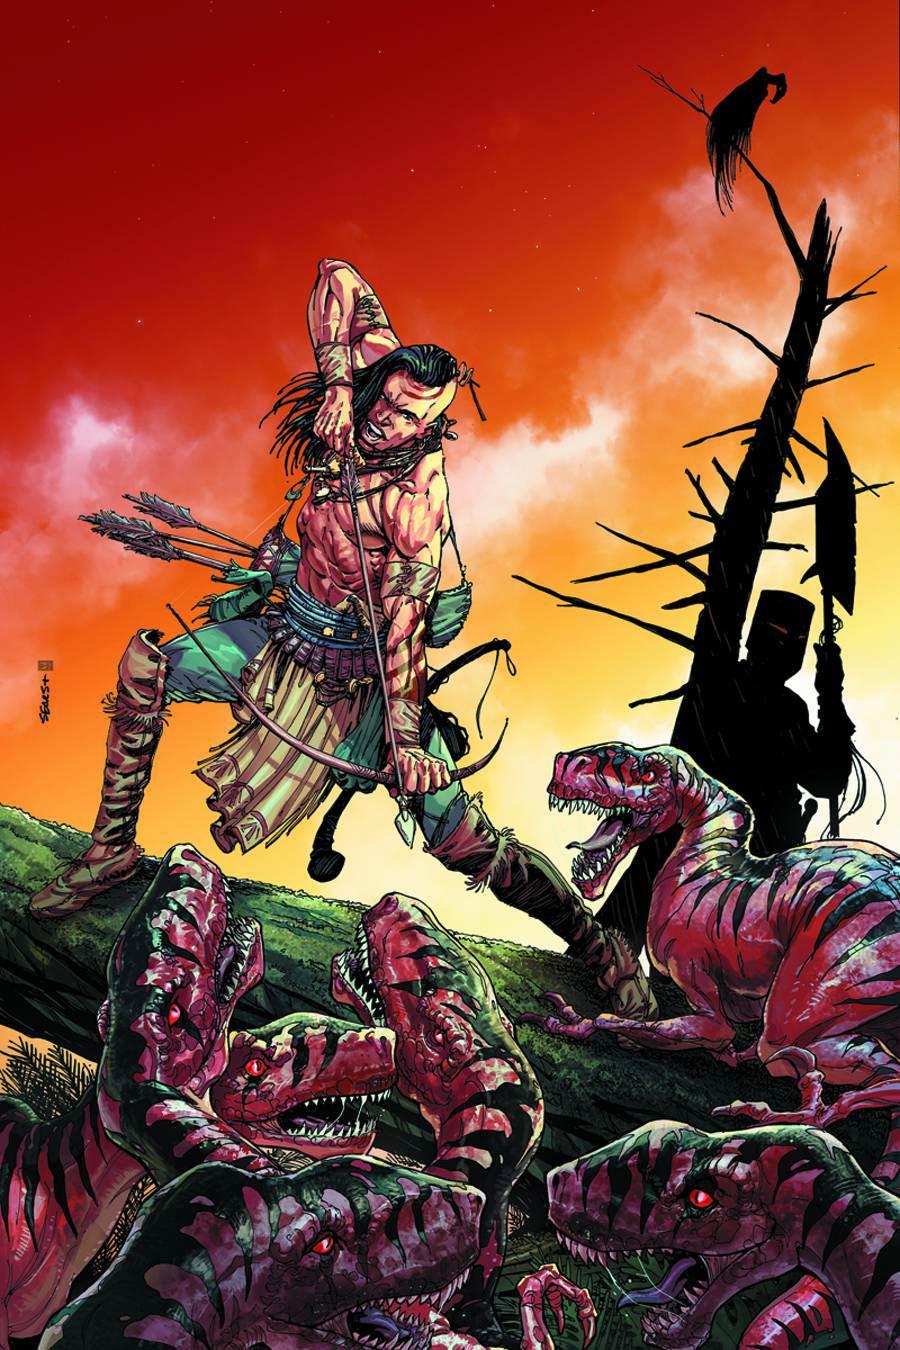 Turok Dinosaur Hunter Vol 2 #1 Cover N Incentive Ken Haeser Cute Hand-Drawn Variant Cover